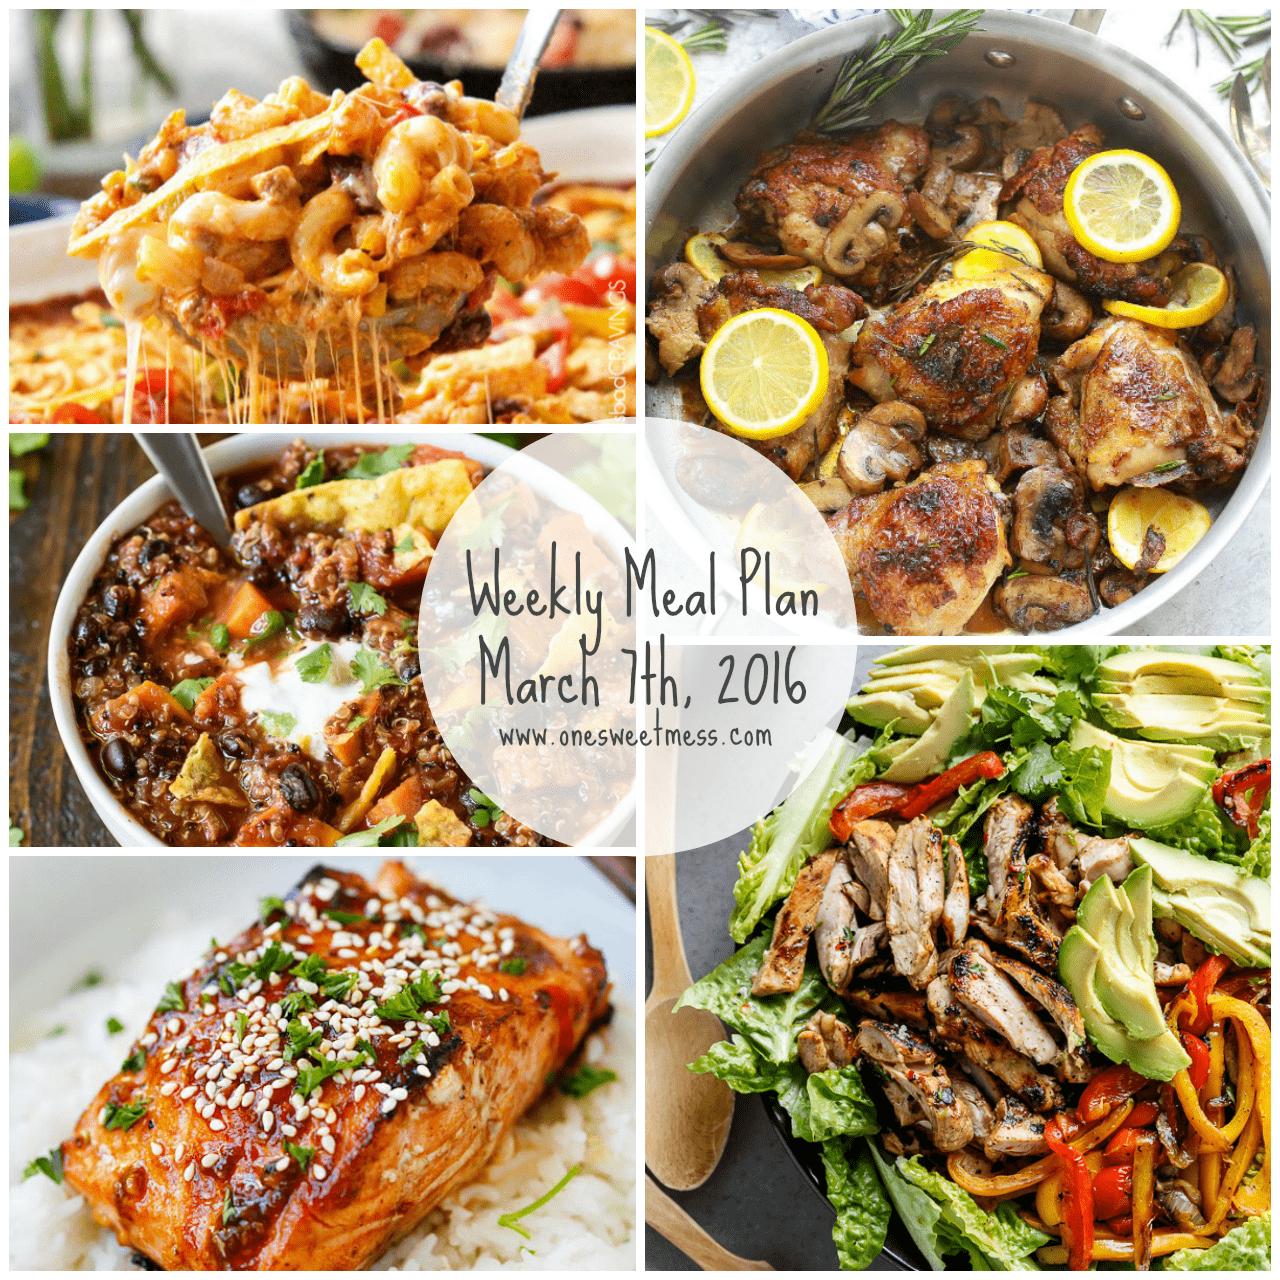 Week of March 7th, 2016 Weekly Meal Plan + Printable Grocery List